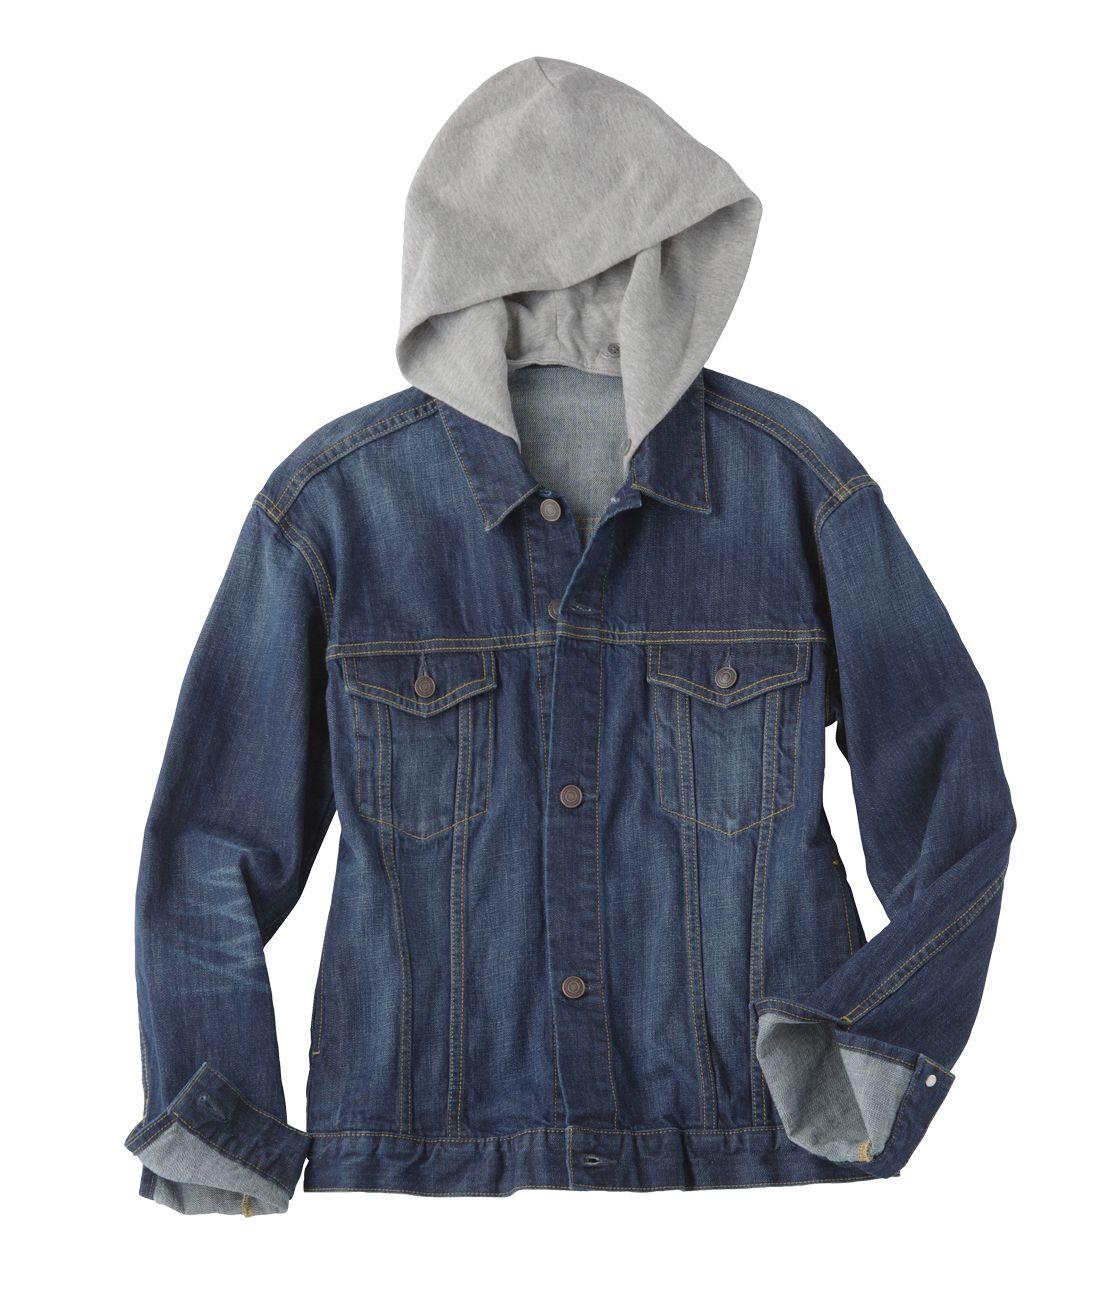 MHB 2WAY denim jacket